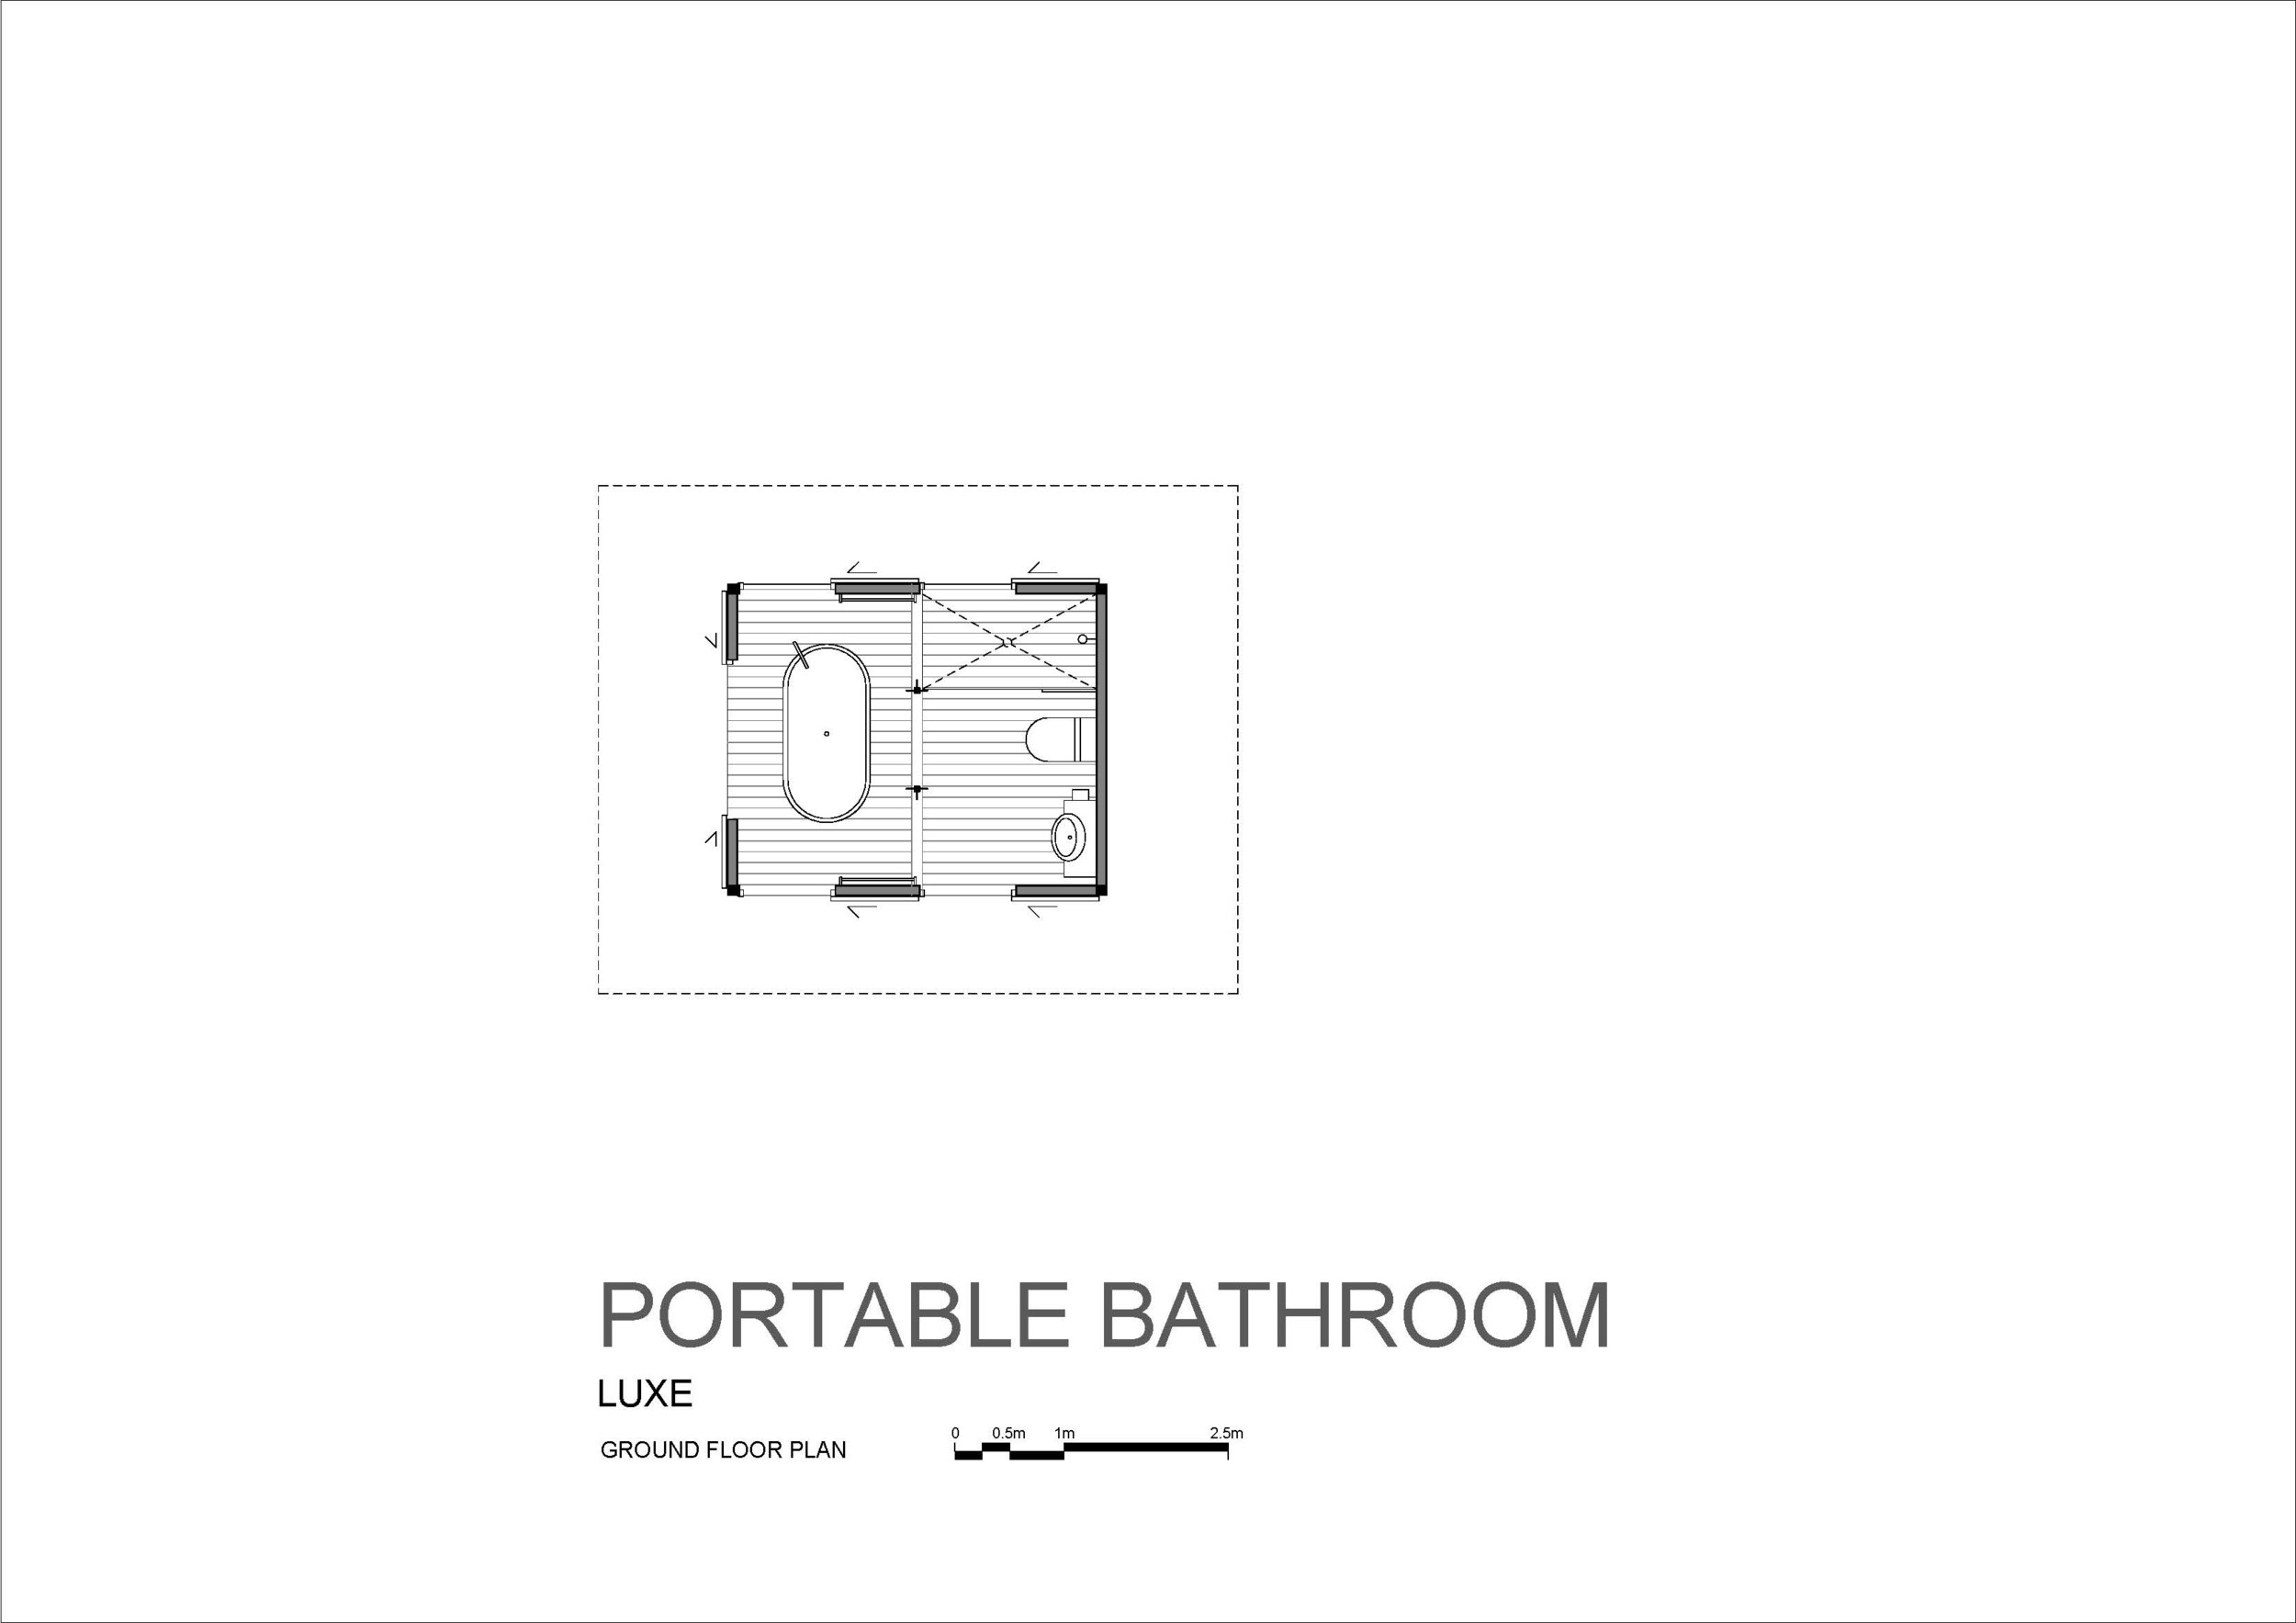 PORTABLE BATHROOM_Page_5.jpg